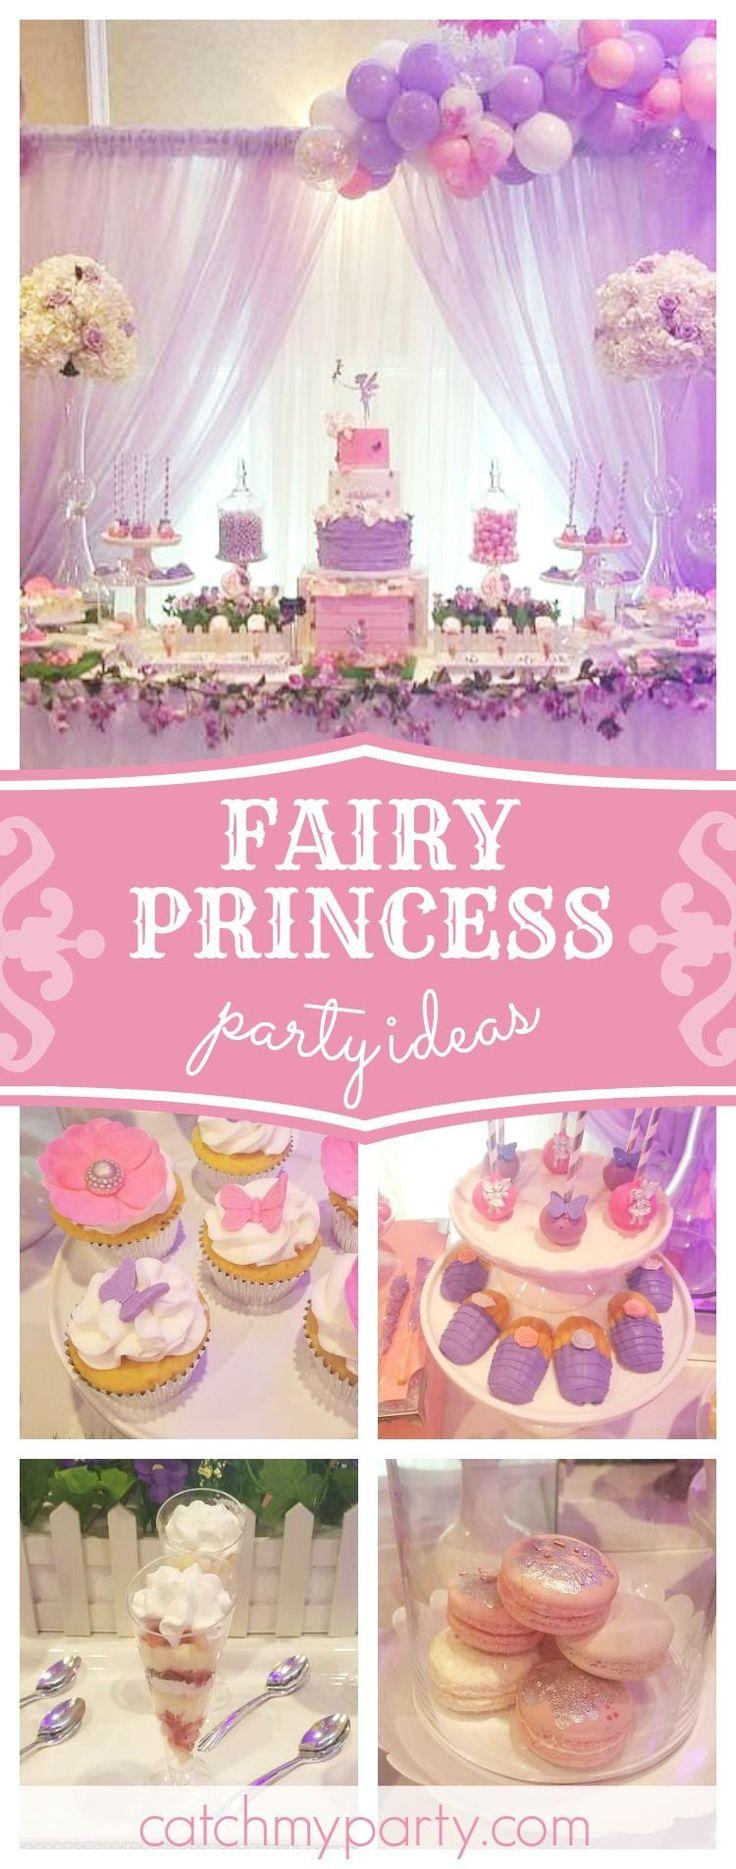 Best princess party ideas images on pinterest